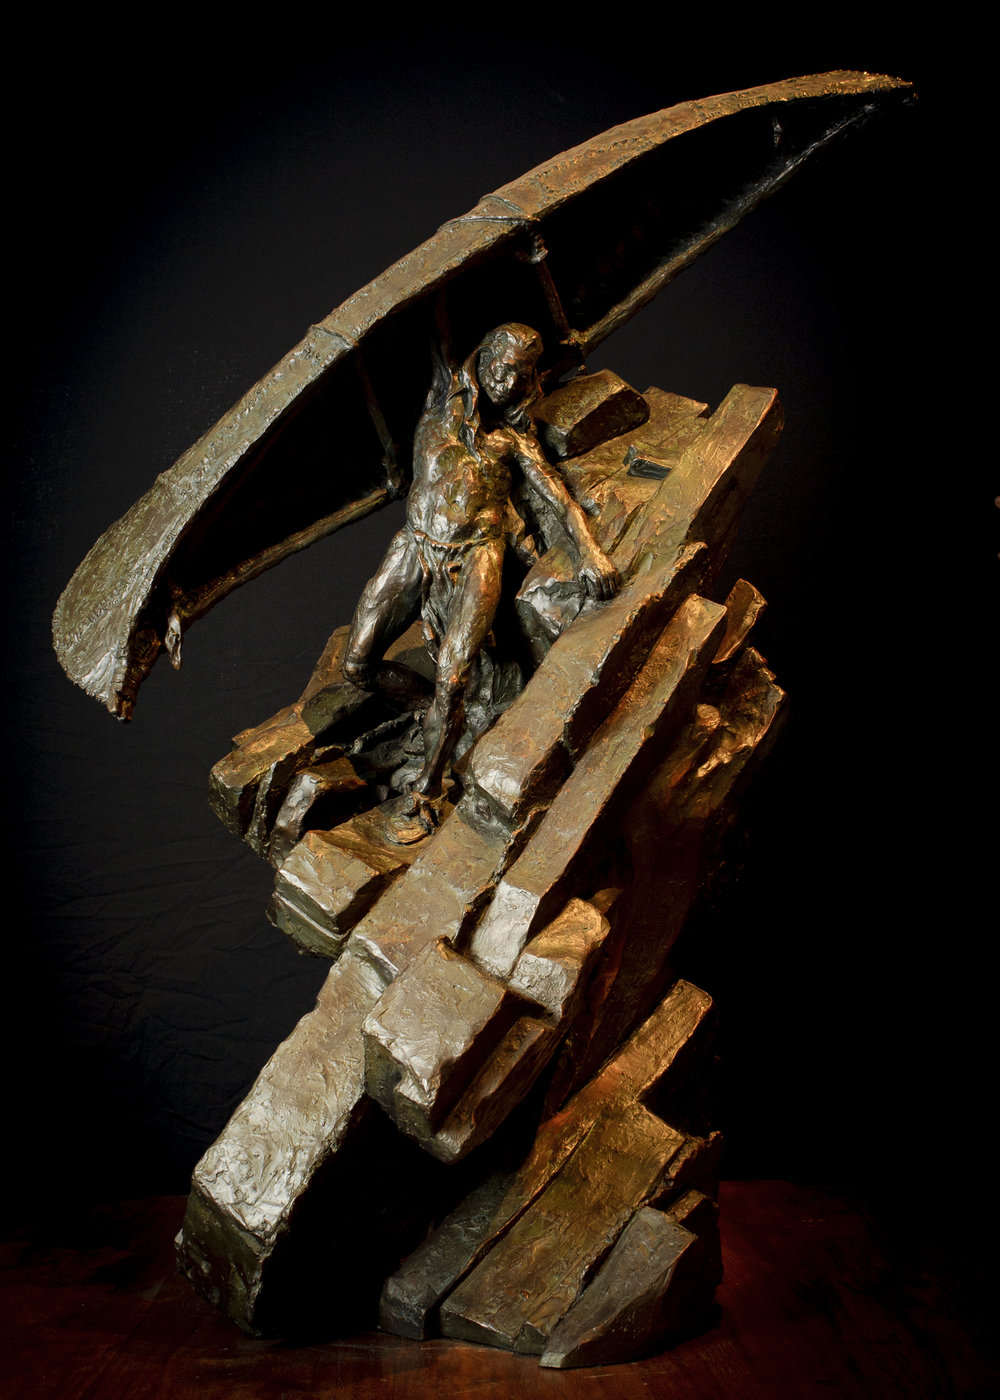 "The Portage | 41"" x 29"" x 22"" | Bronze | $16,000 | Edition of 30"